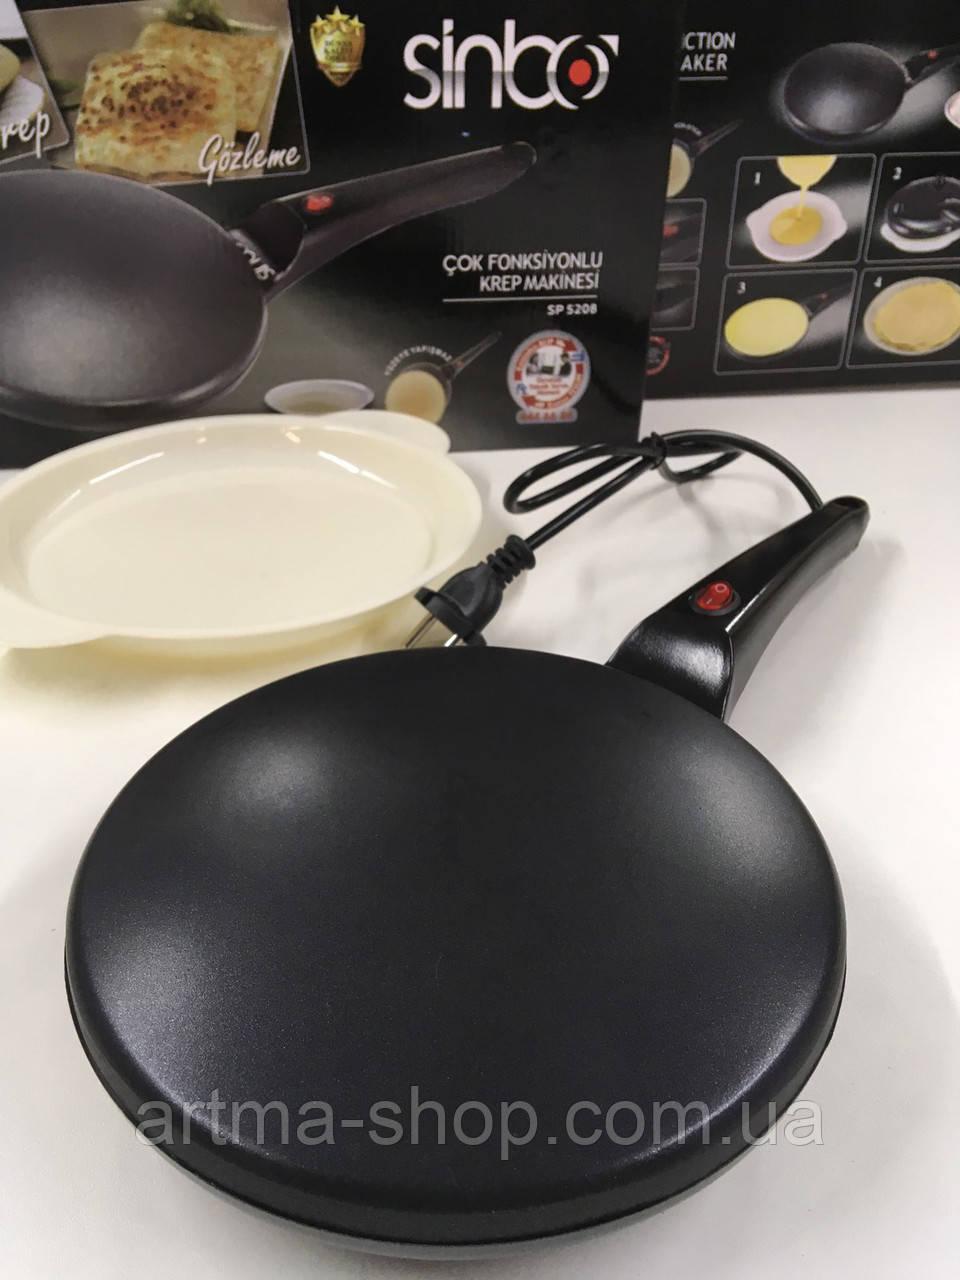 Блинница Sinbo SP 5208 Crepe Maker Pro Black